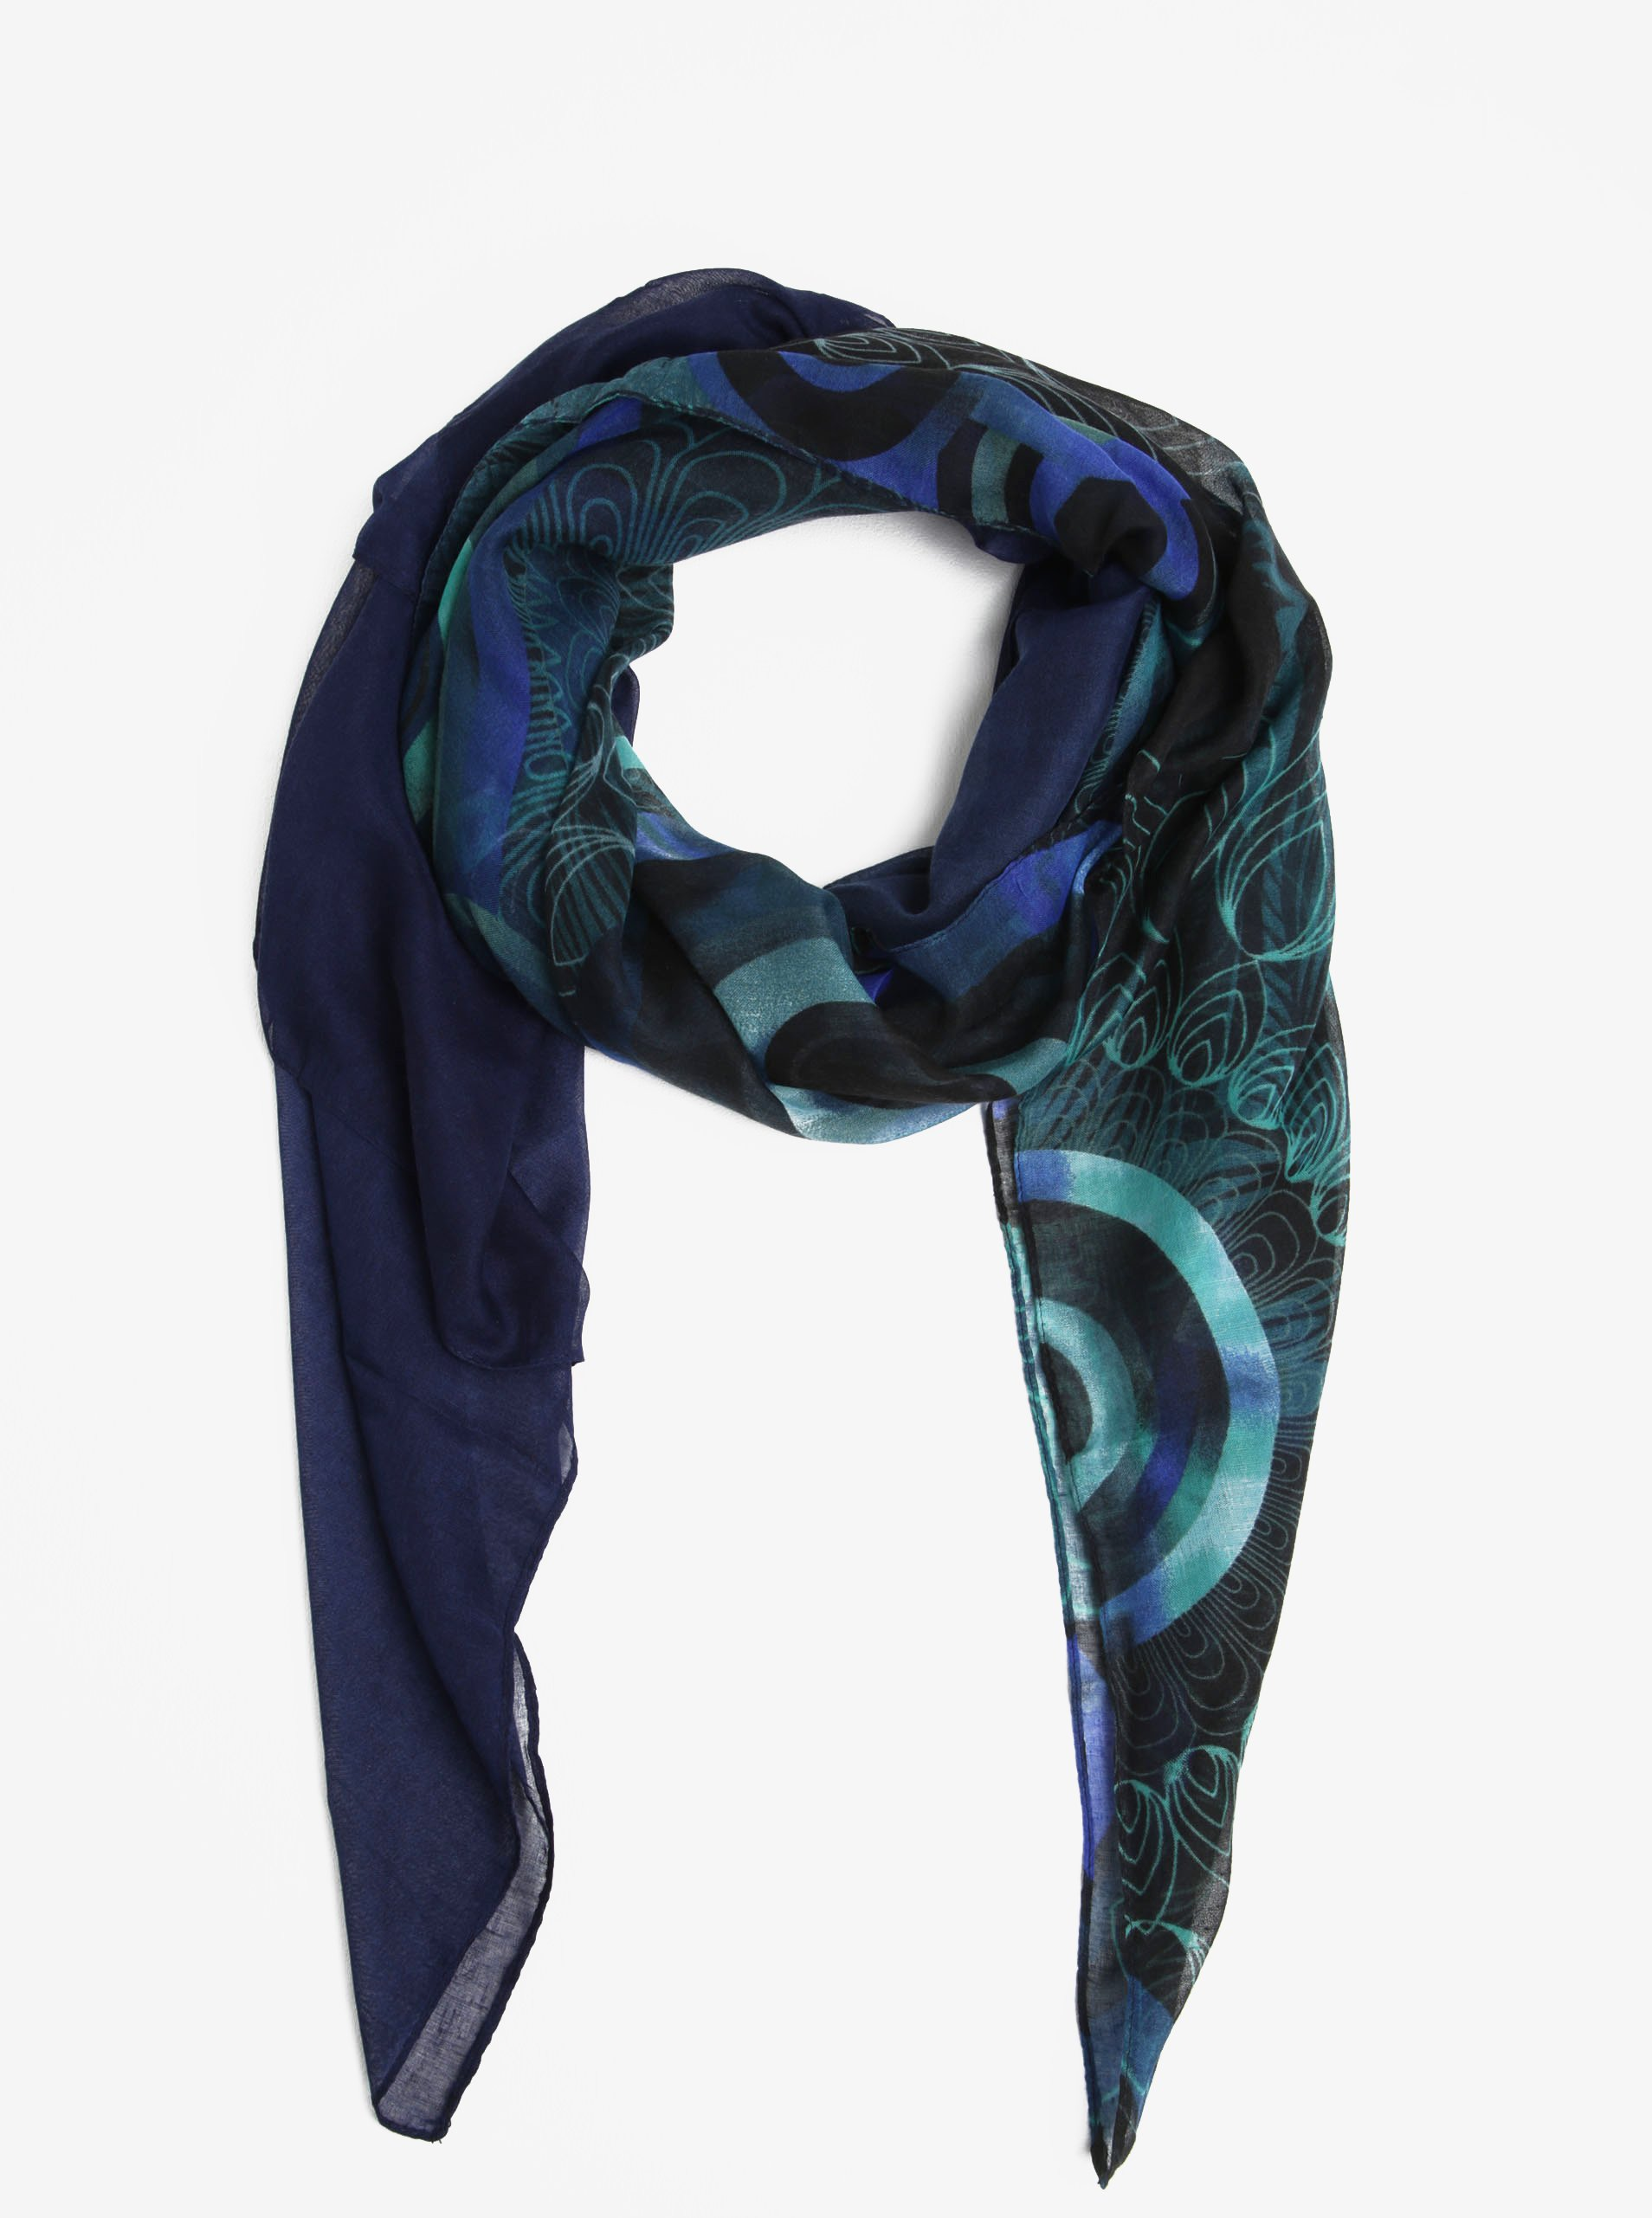 Modrý vzorovaný šátek Desigual Winter Floral Big